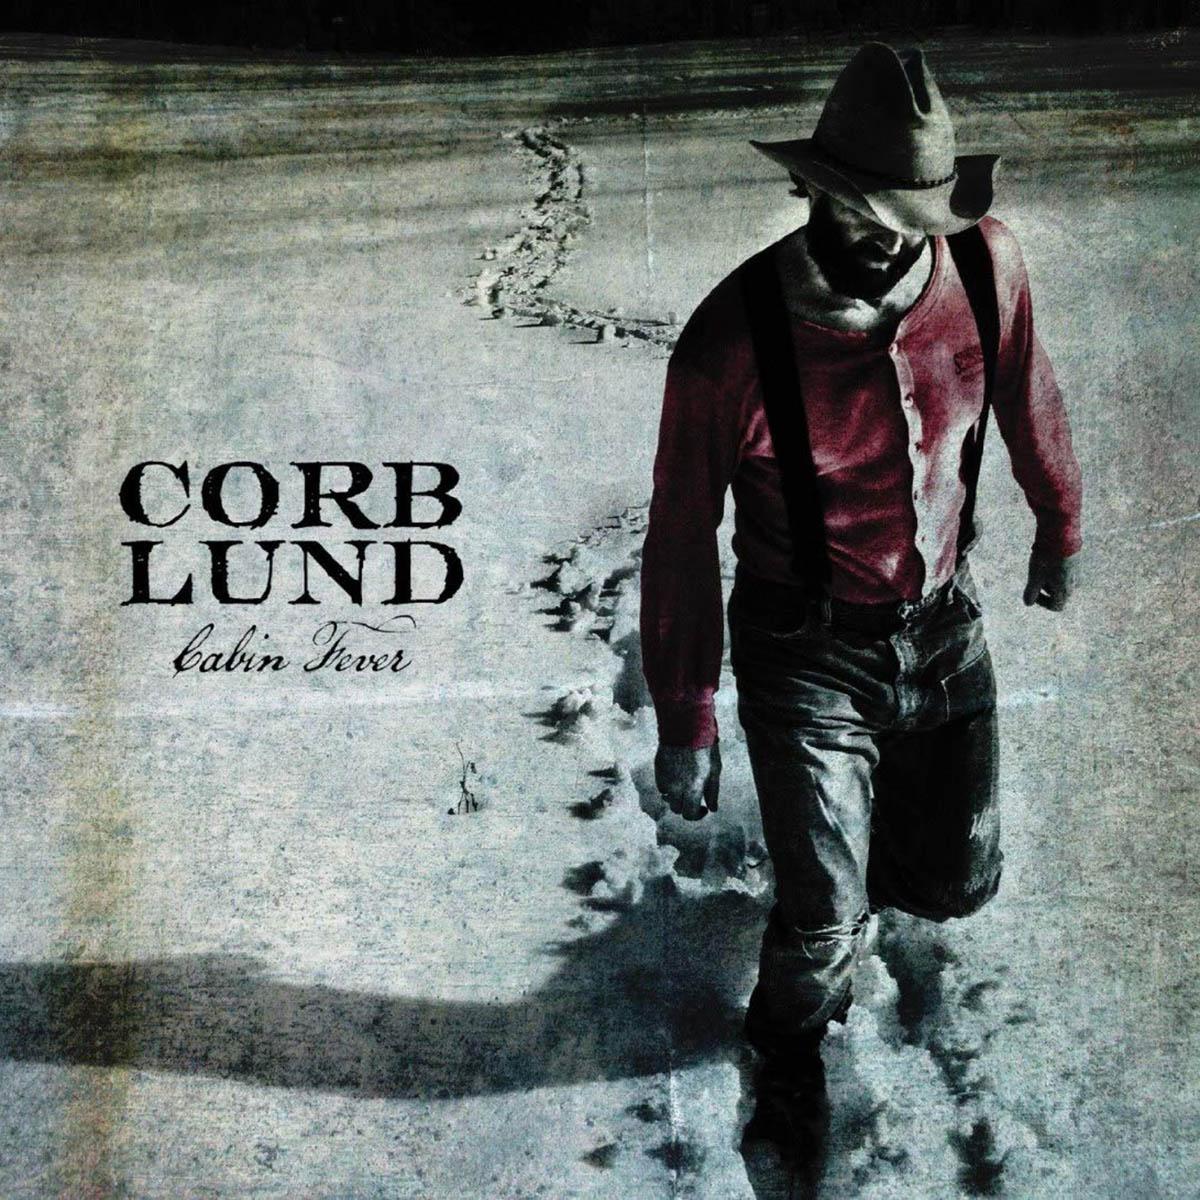 Corb Lund, Cabin Fever